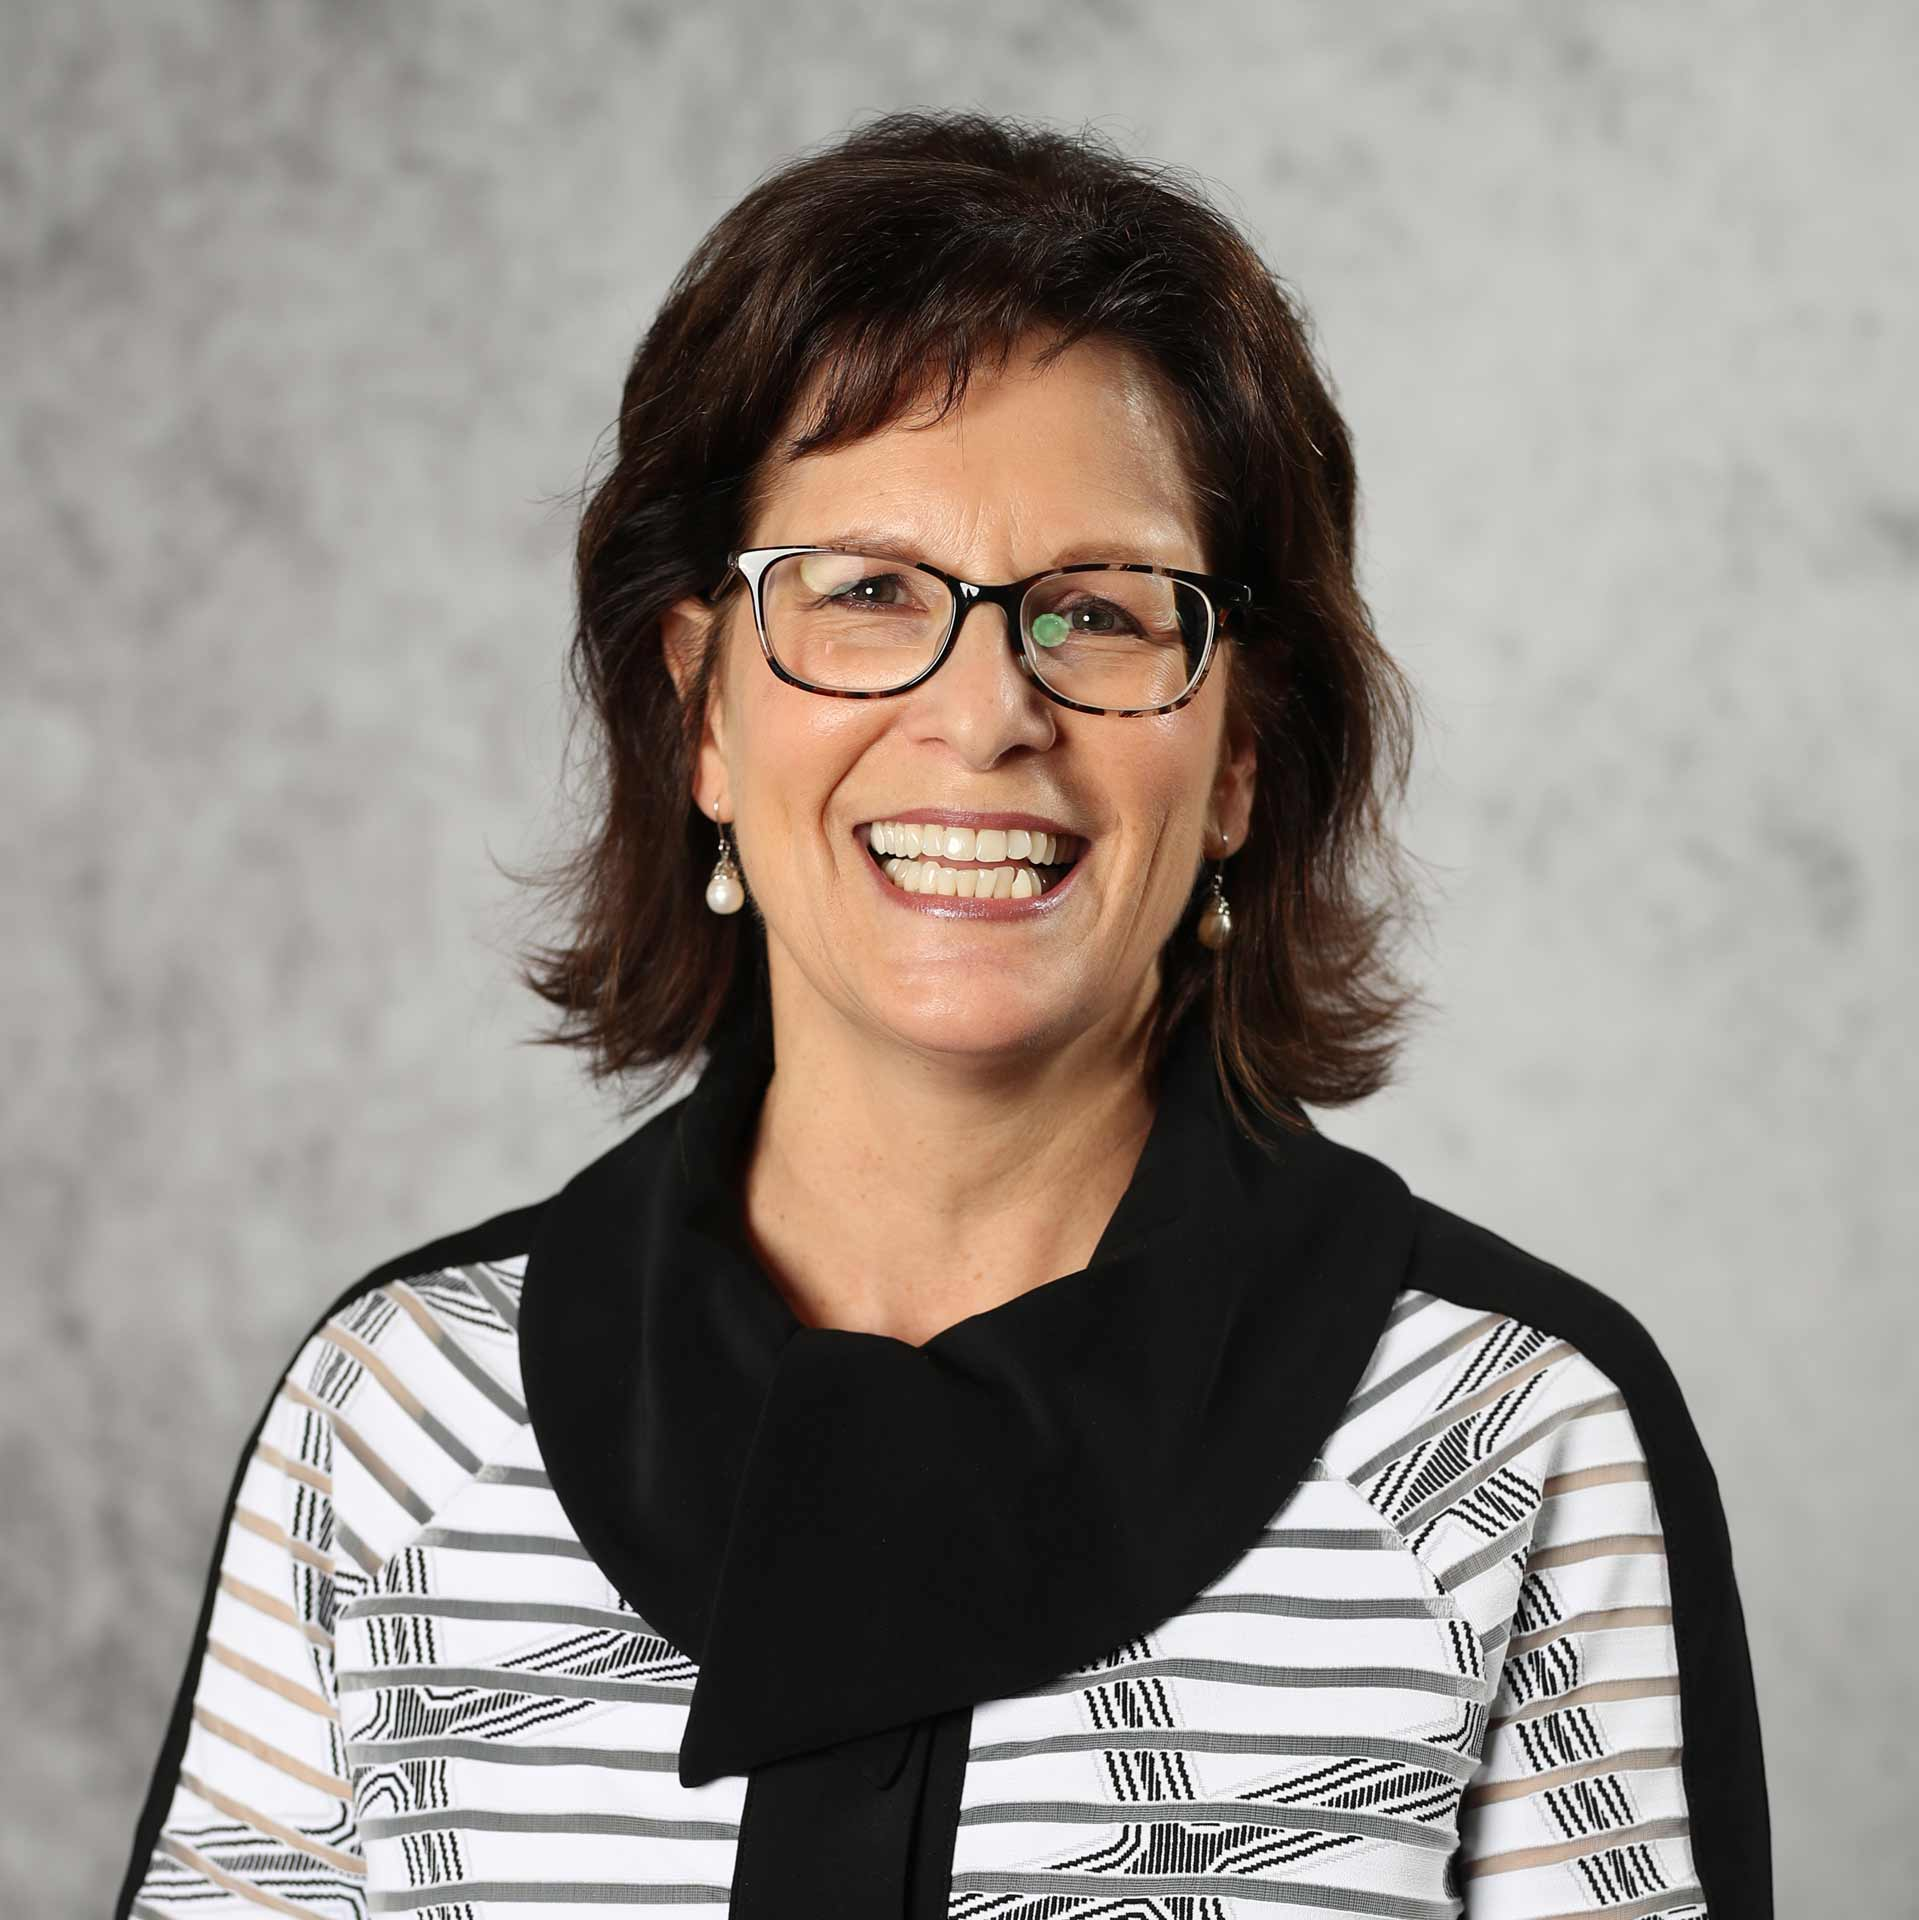 Barbara Titus, 2021 Emerald Leader